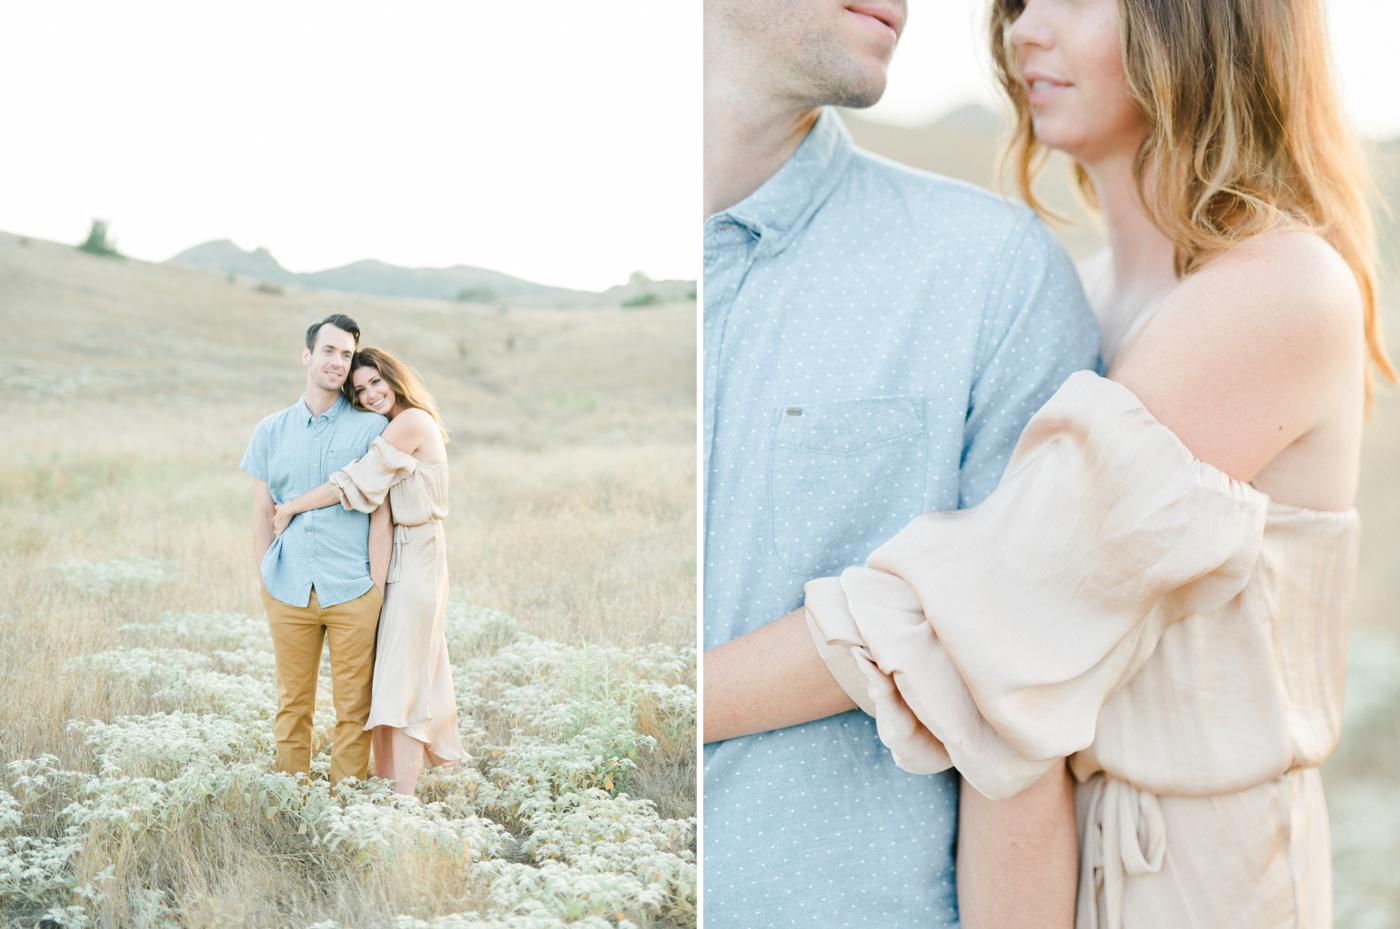 Malibu_Creek_State_Park_Romantic_Engagement_Session_C&J_romantic-25.jpg